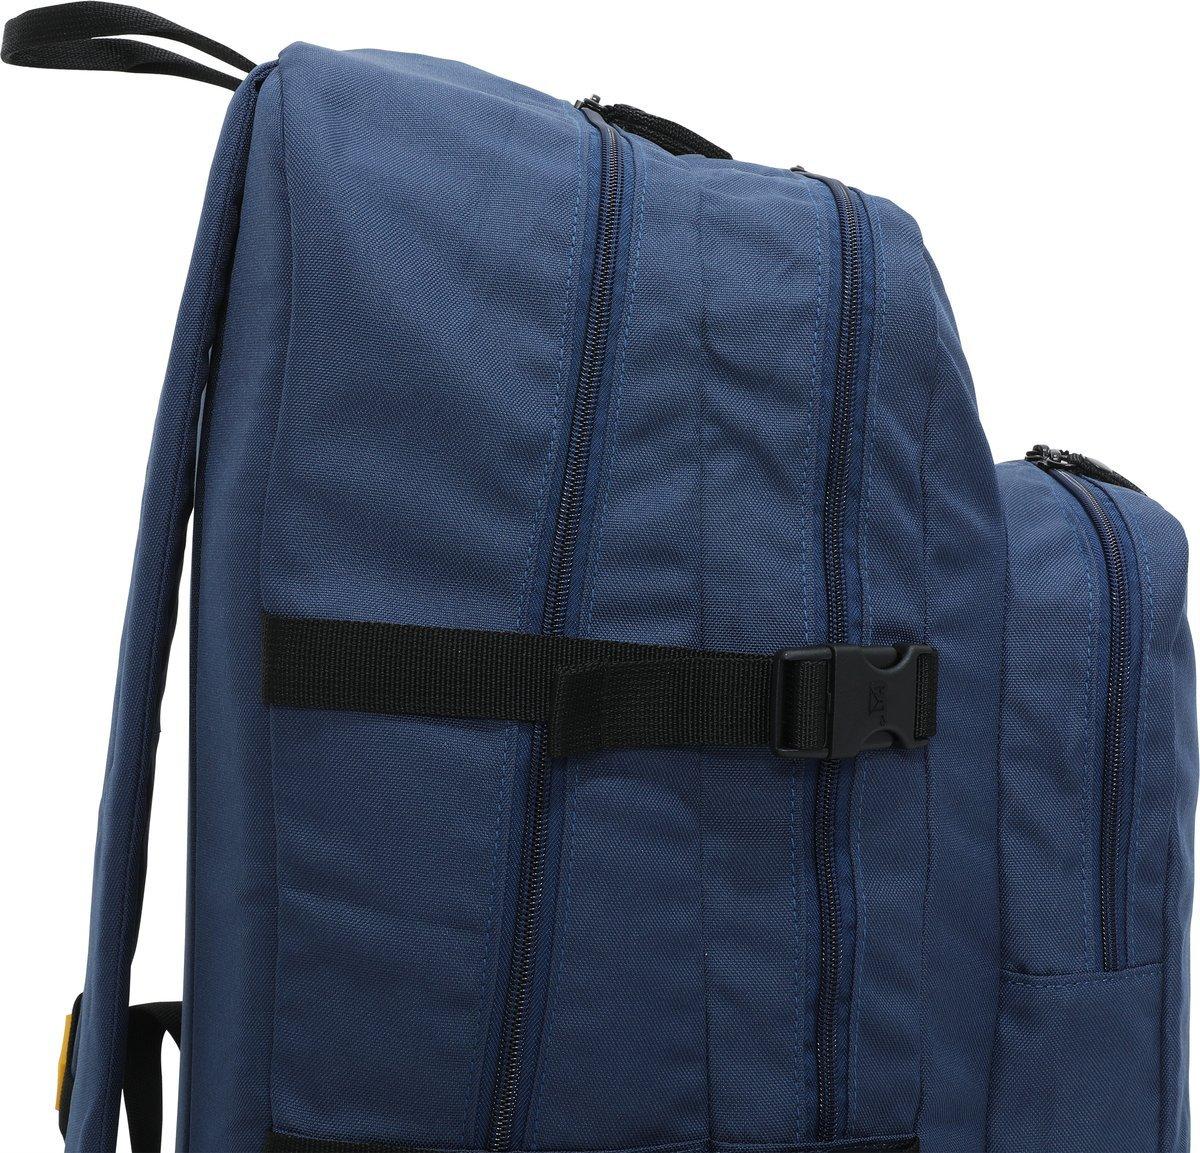 "Plecak Briso na laptopa do 15"" CAT Caterpillar niebieski"